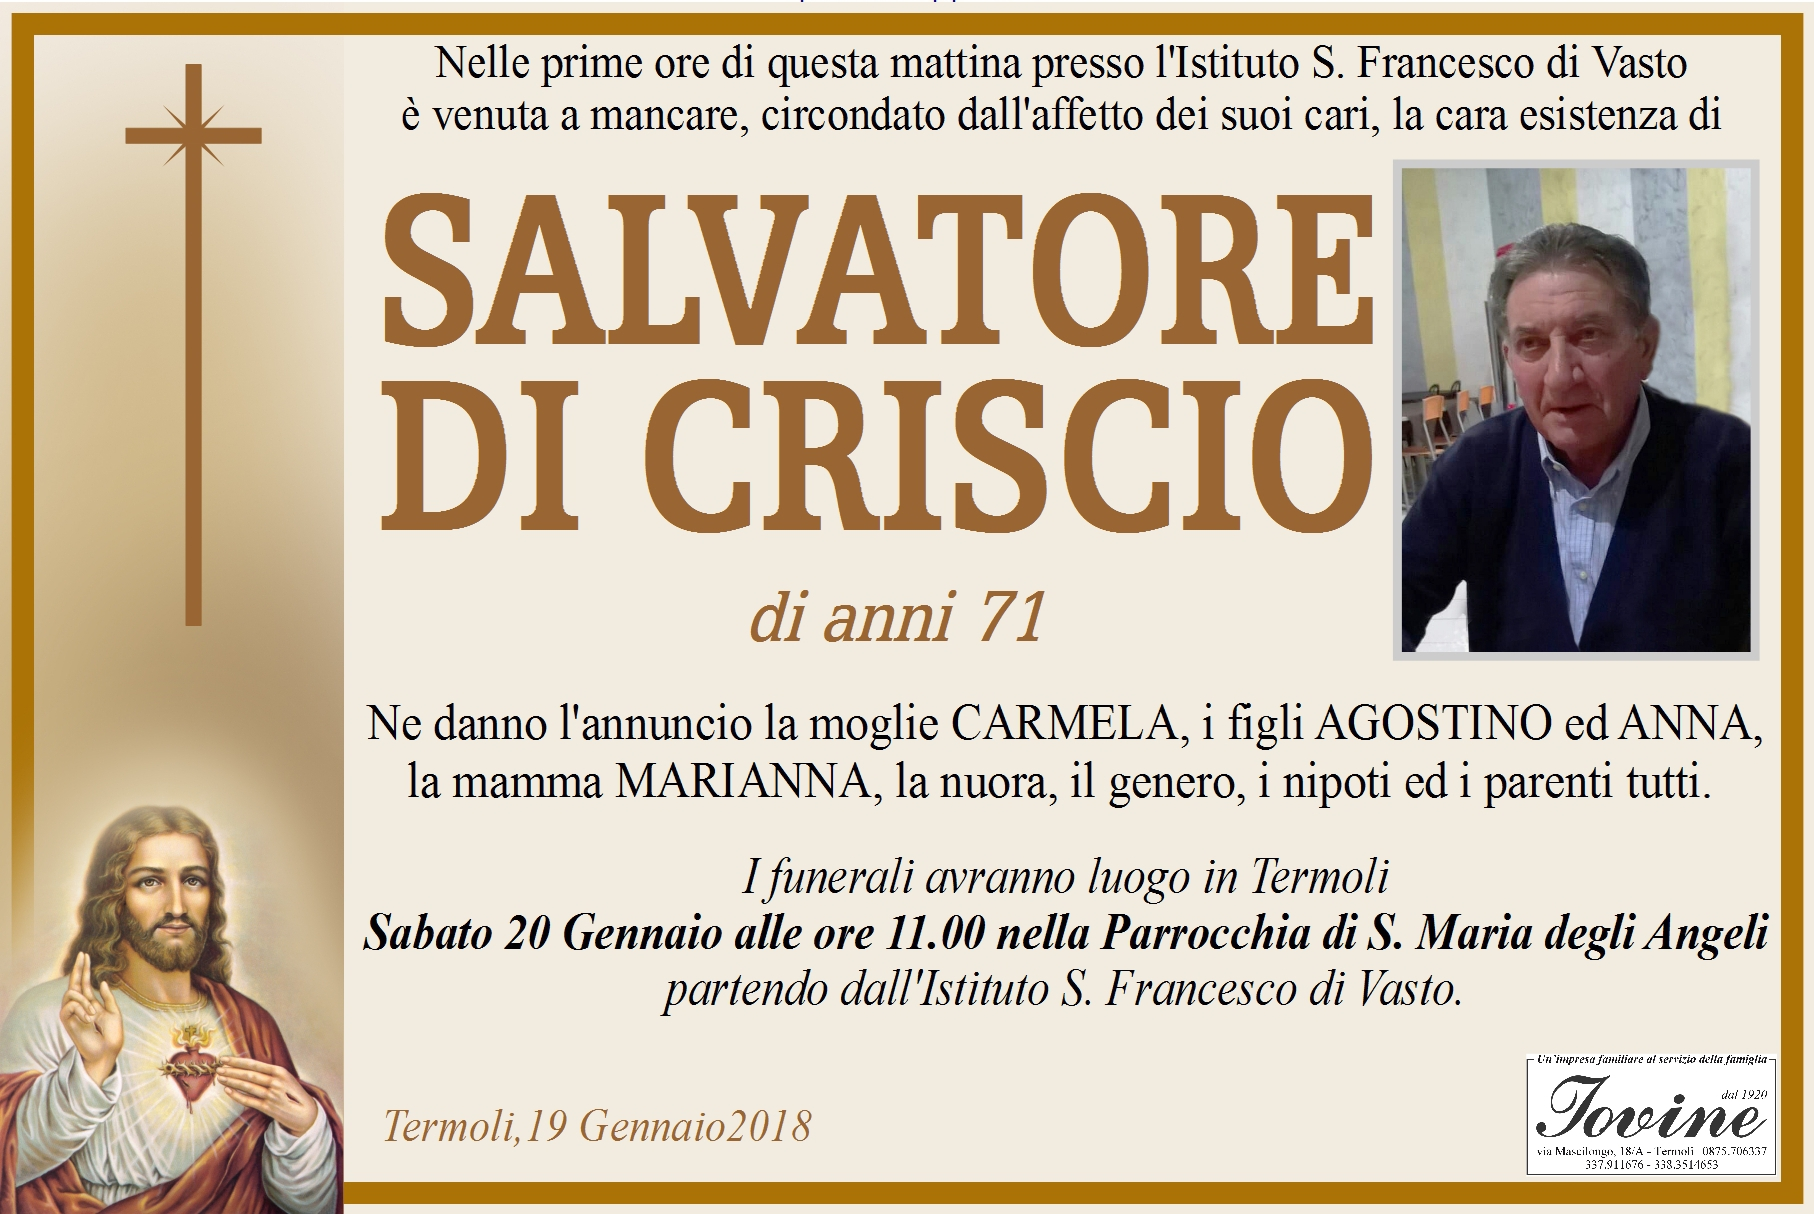 Salvatore Di Criscio – 19/01/2018 – Termoli – Onoranze Funebri Iovine